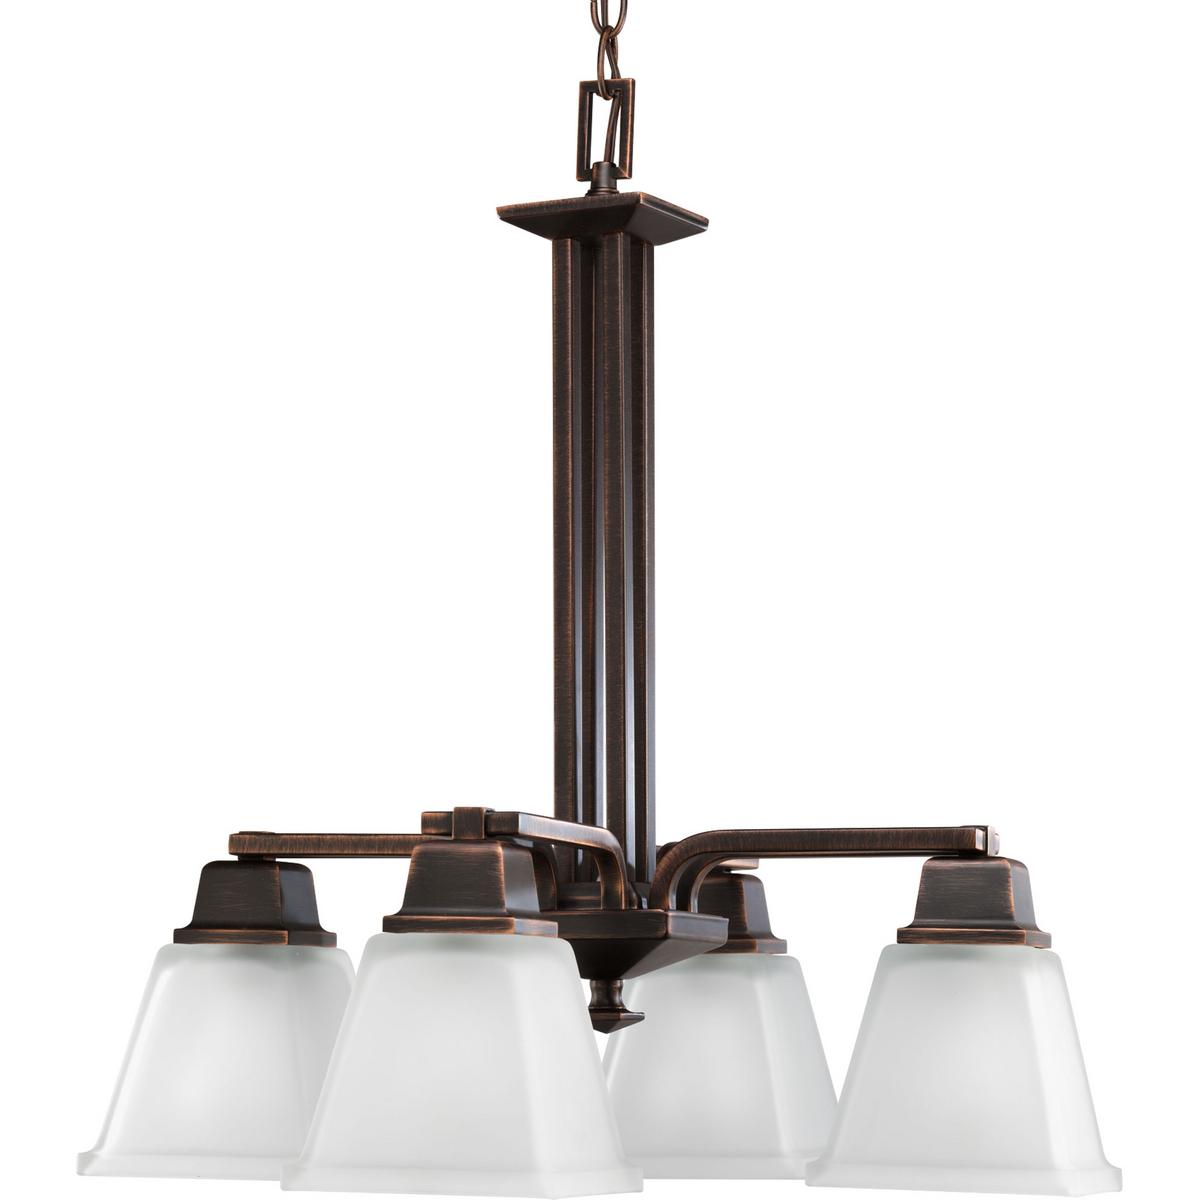 PRO P4002-74 4X100M Venetian Bronze Etched Glass Chandelier